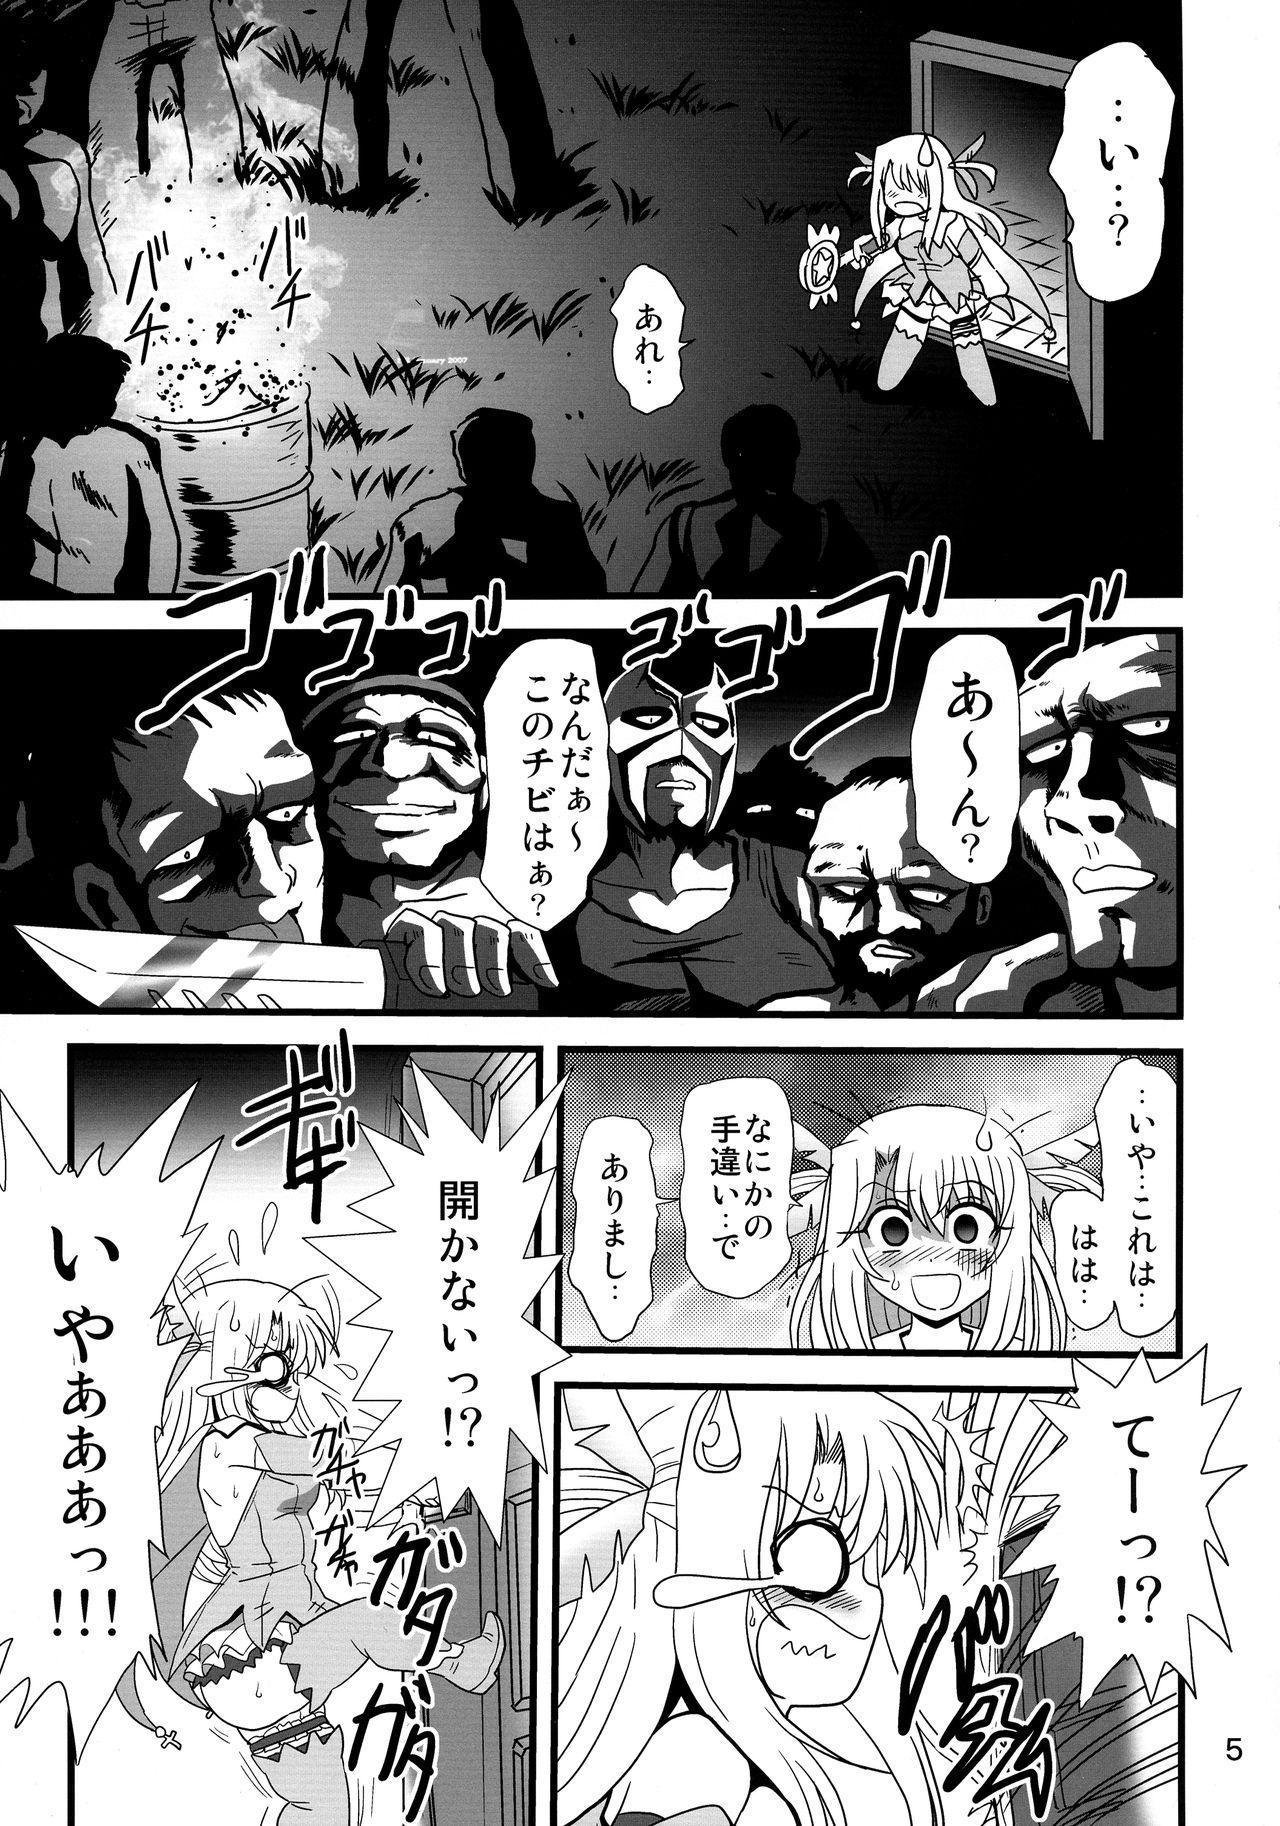 Wana ni Ochita Eiyuu Shoukan 3 4